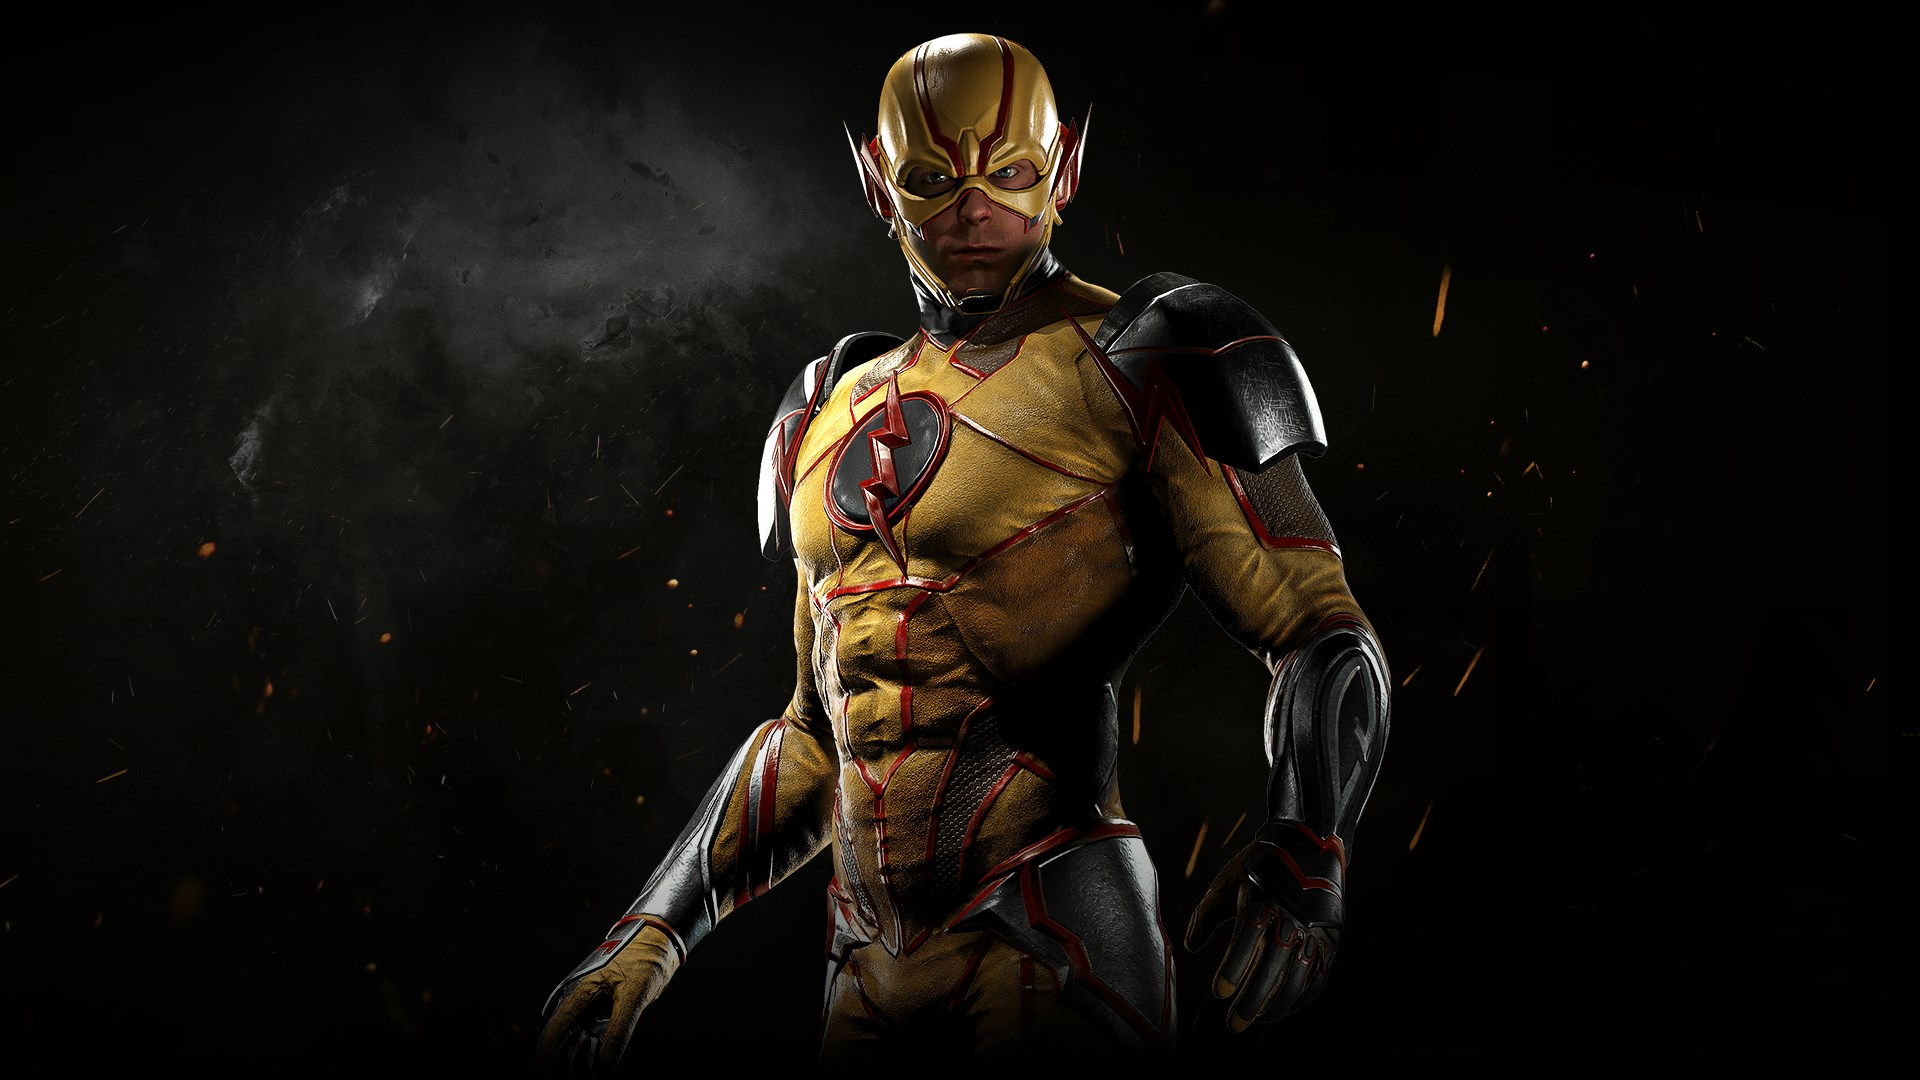 Ekskluzywna skórka Reverse Flasha